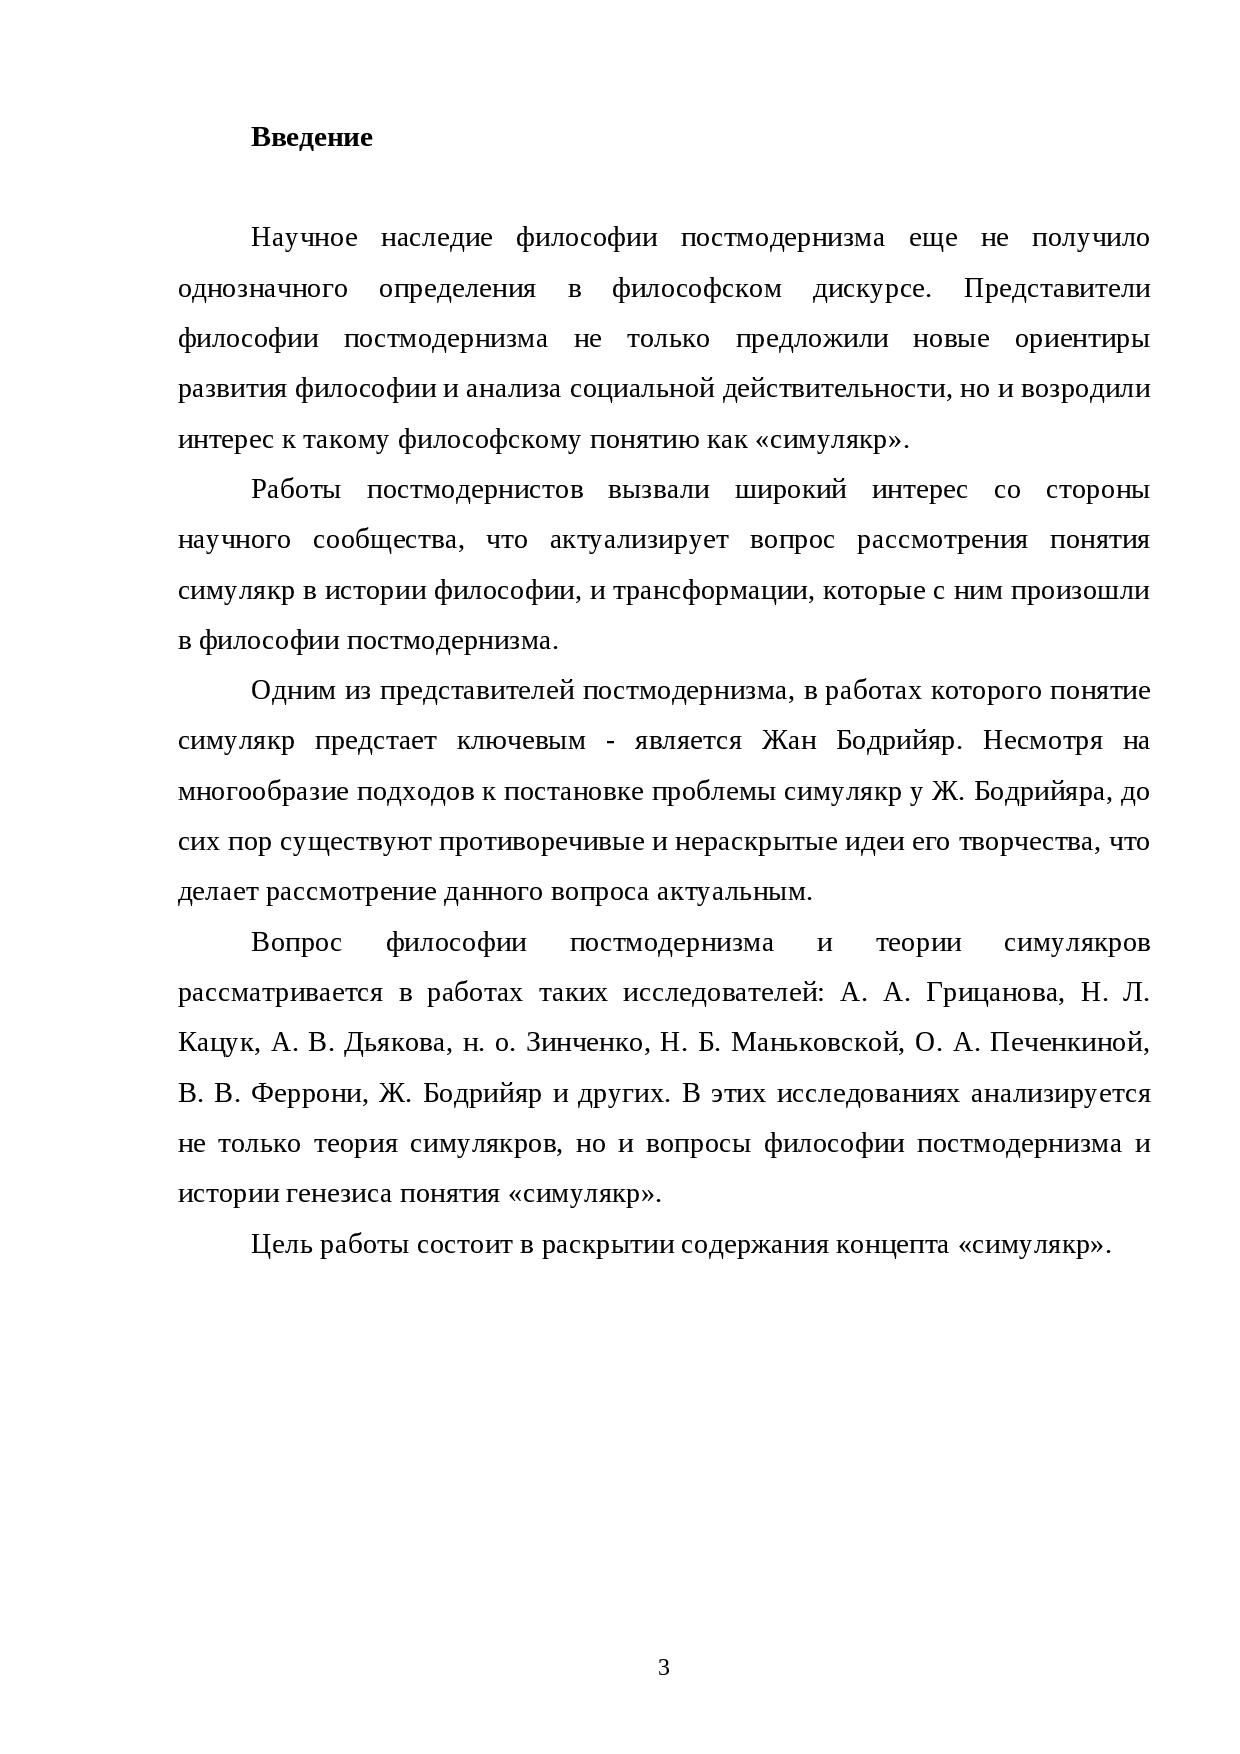 Симулякр — википедия